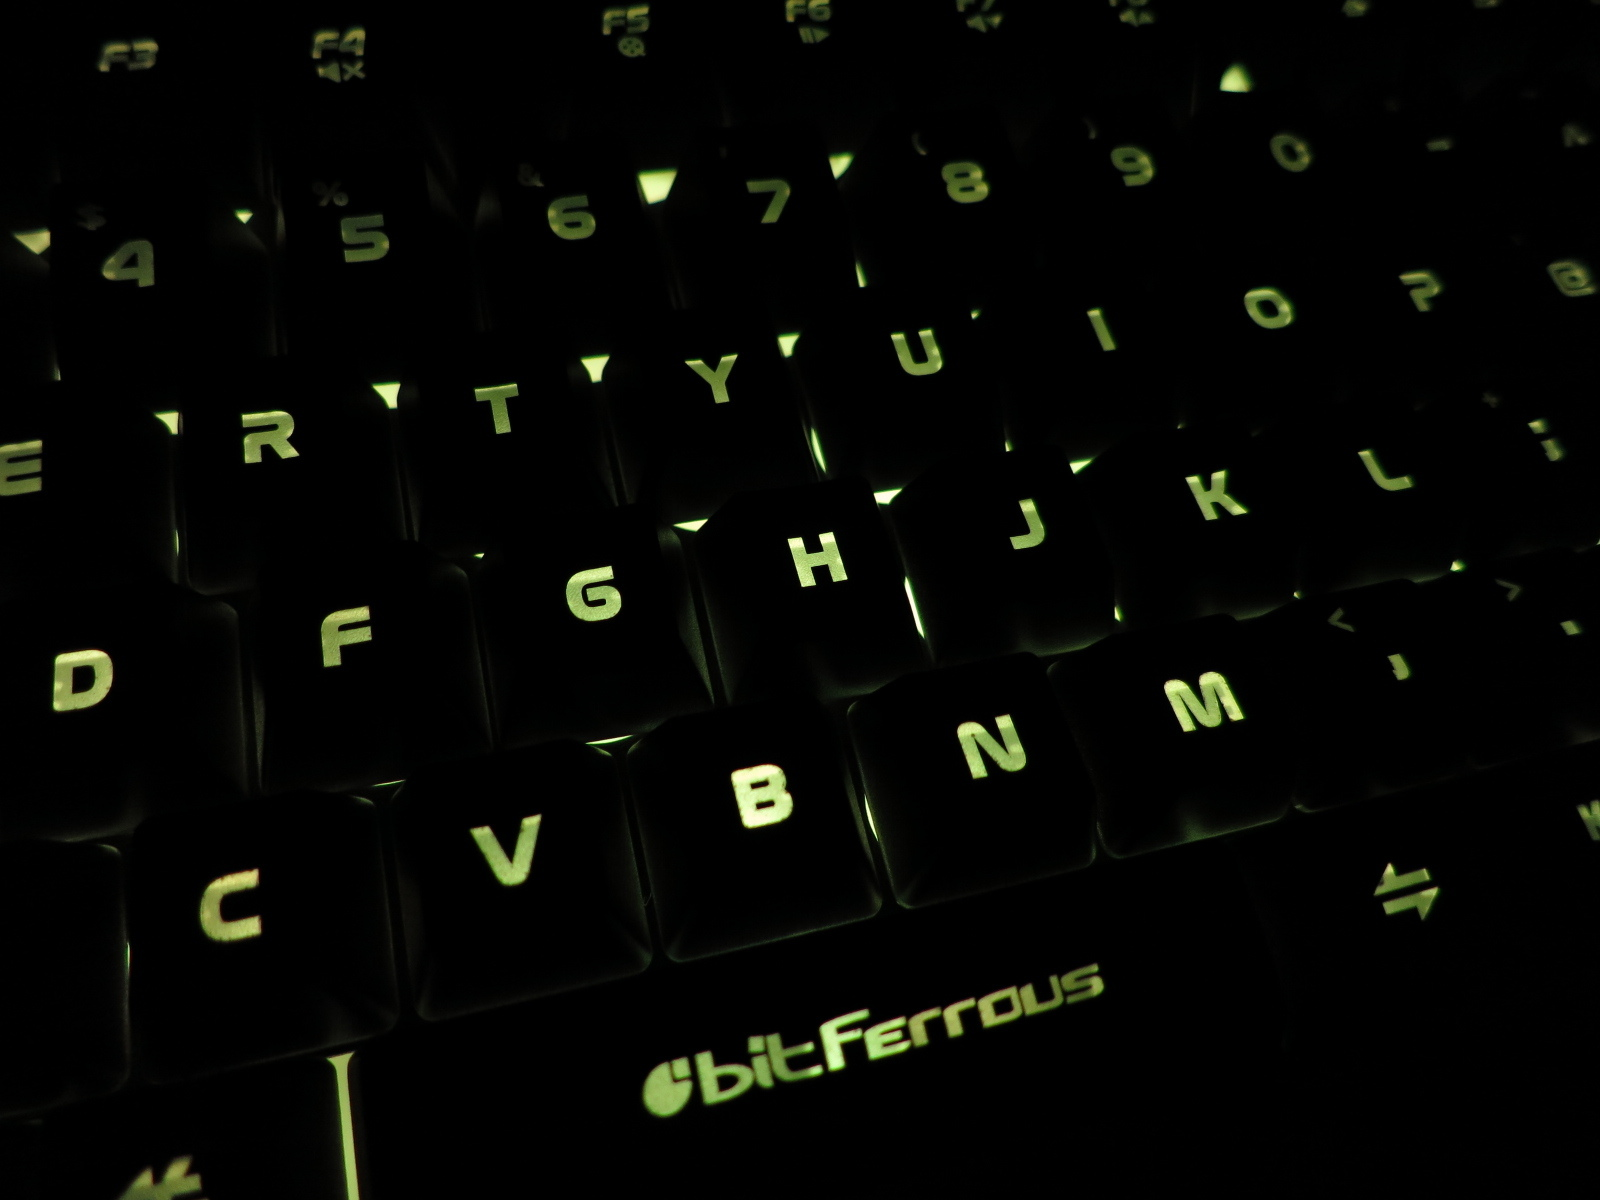 BFKB108ILBK_22.jpg